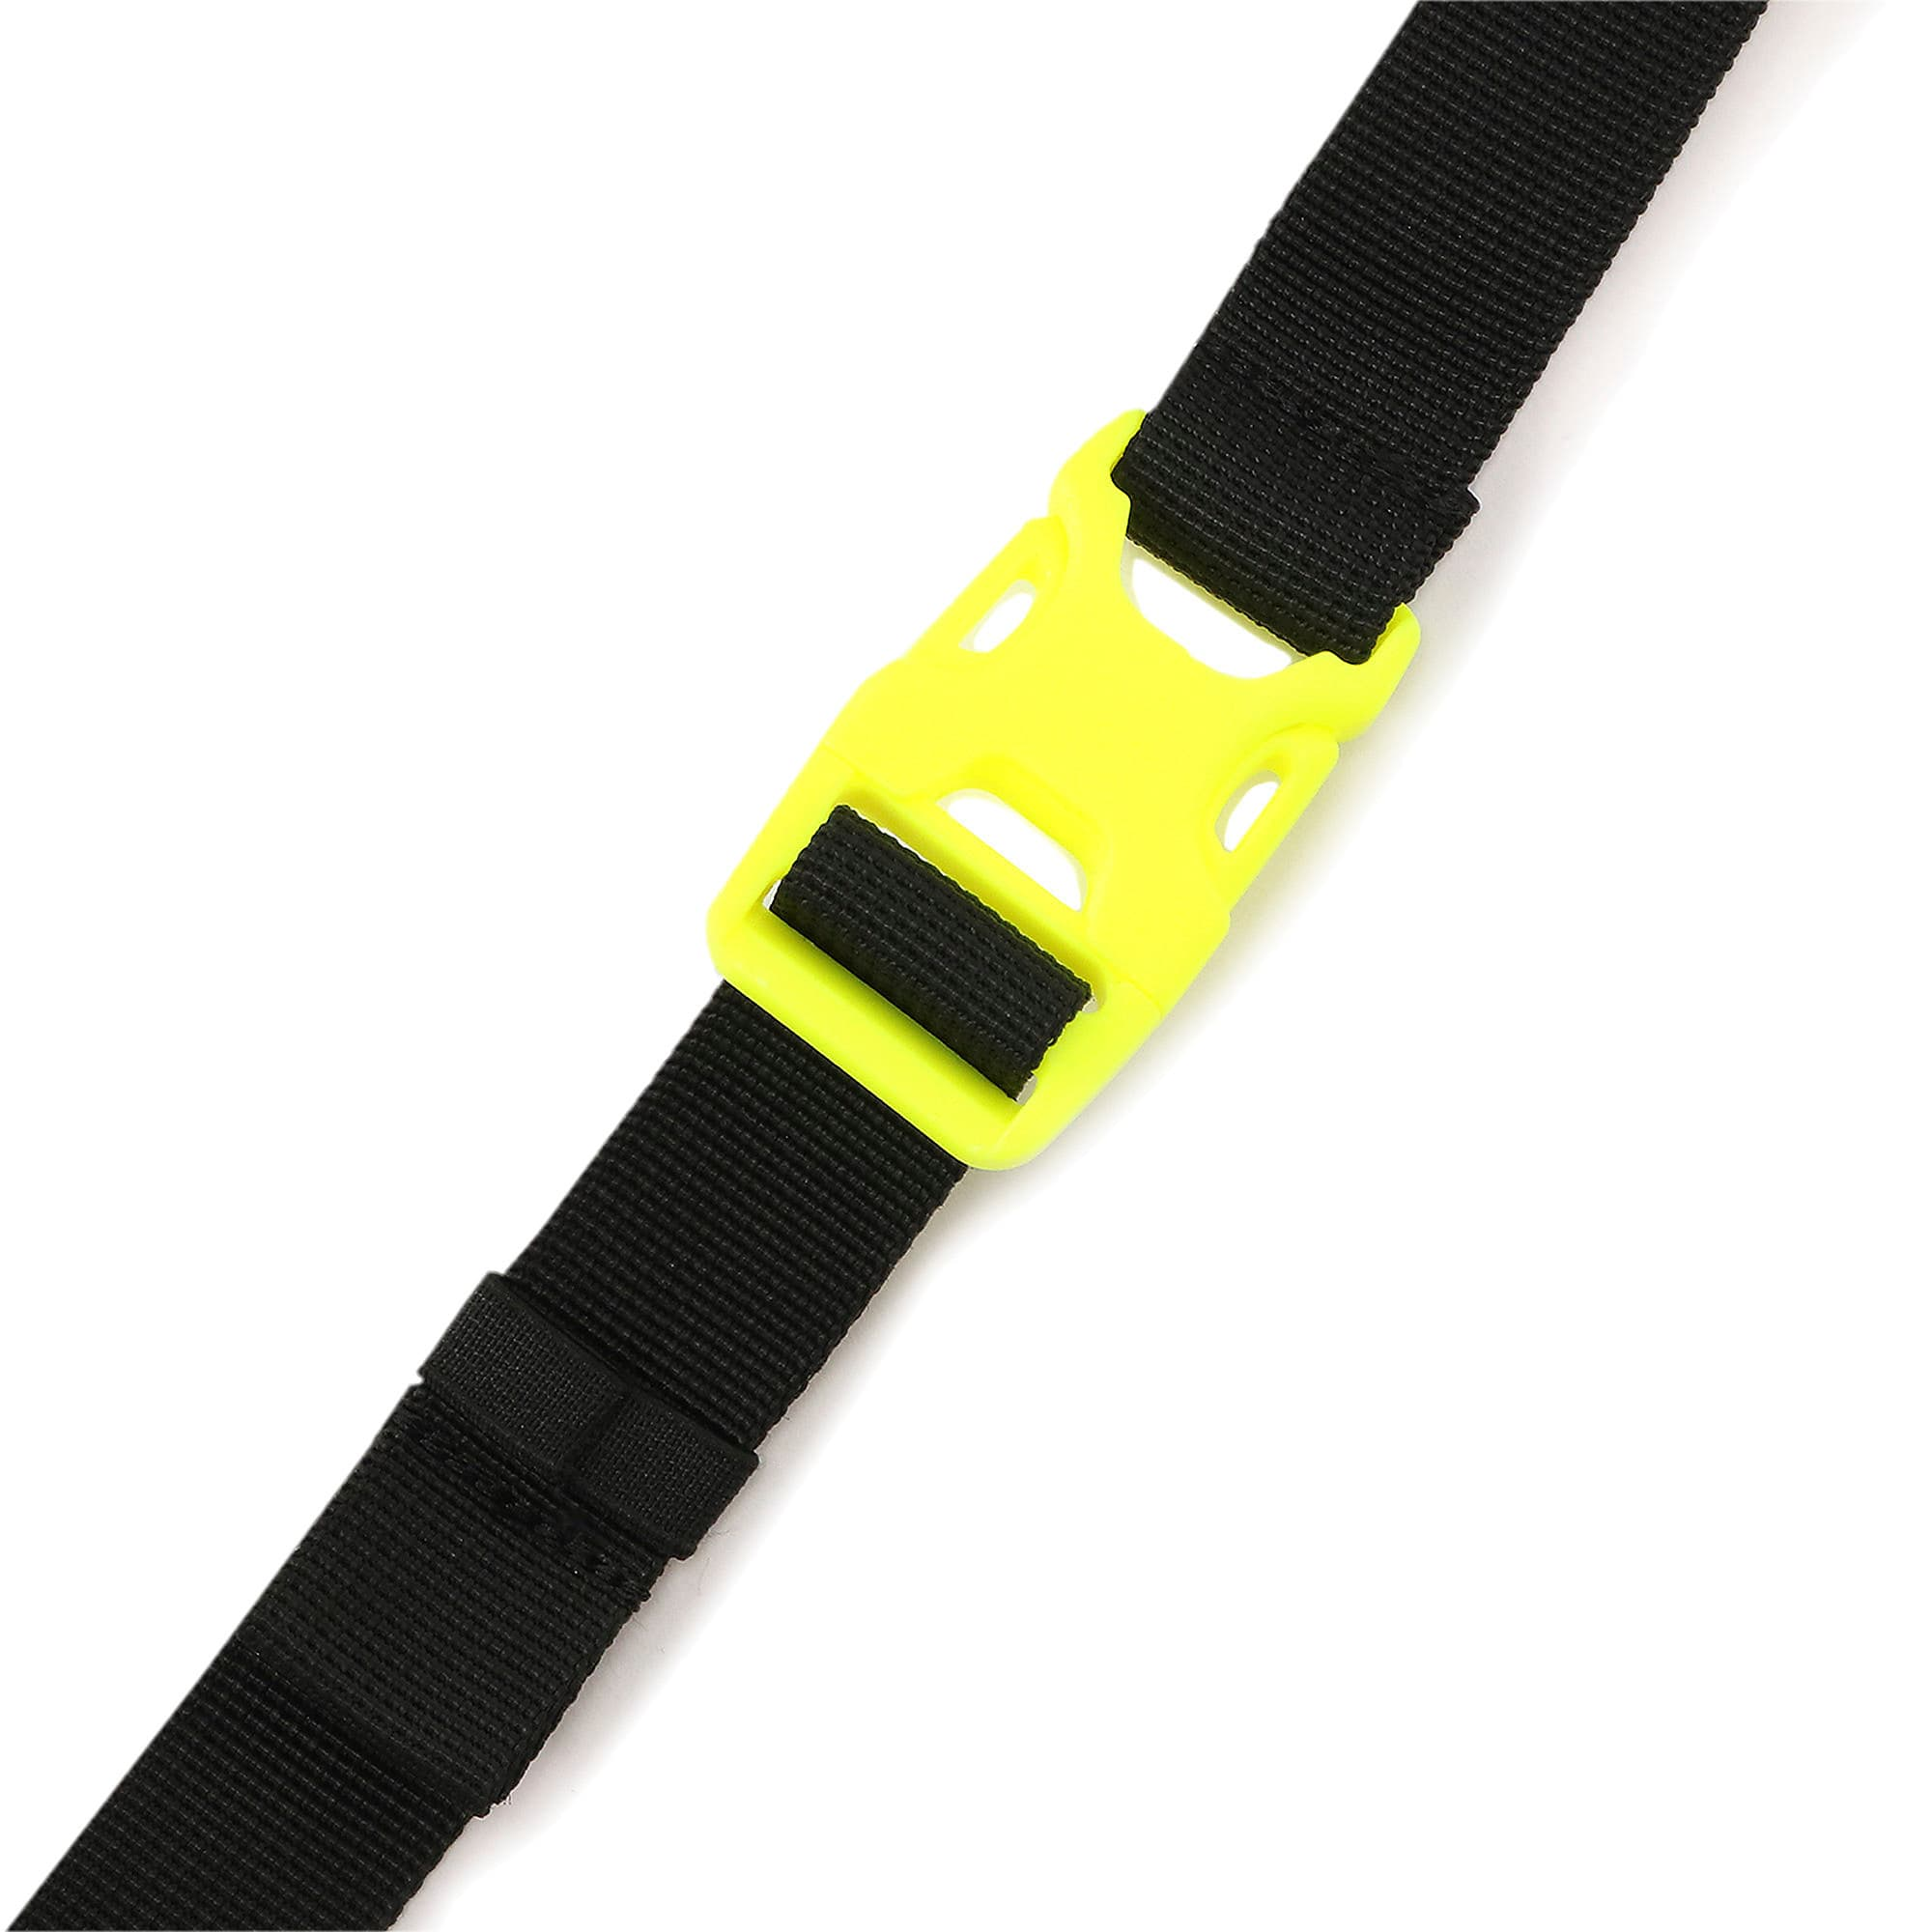 Thumbnail 7 of ランニング PR クラシック ウエストバッグ 0.8L, Puma Black-Yellow Alert, medium-JPN